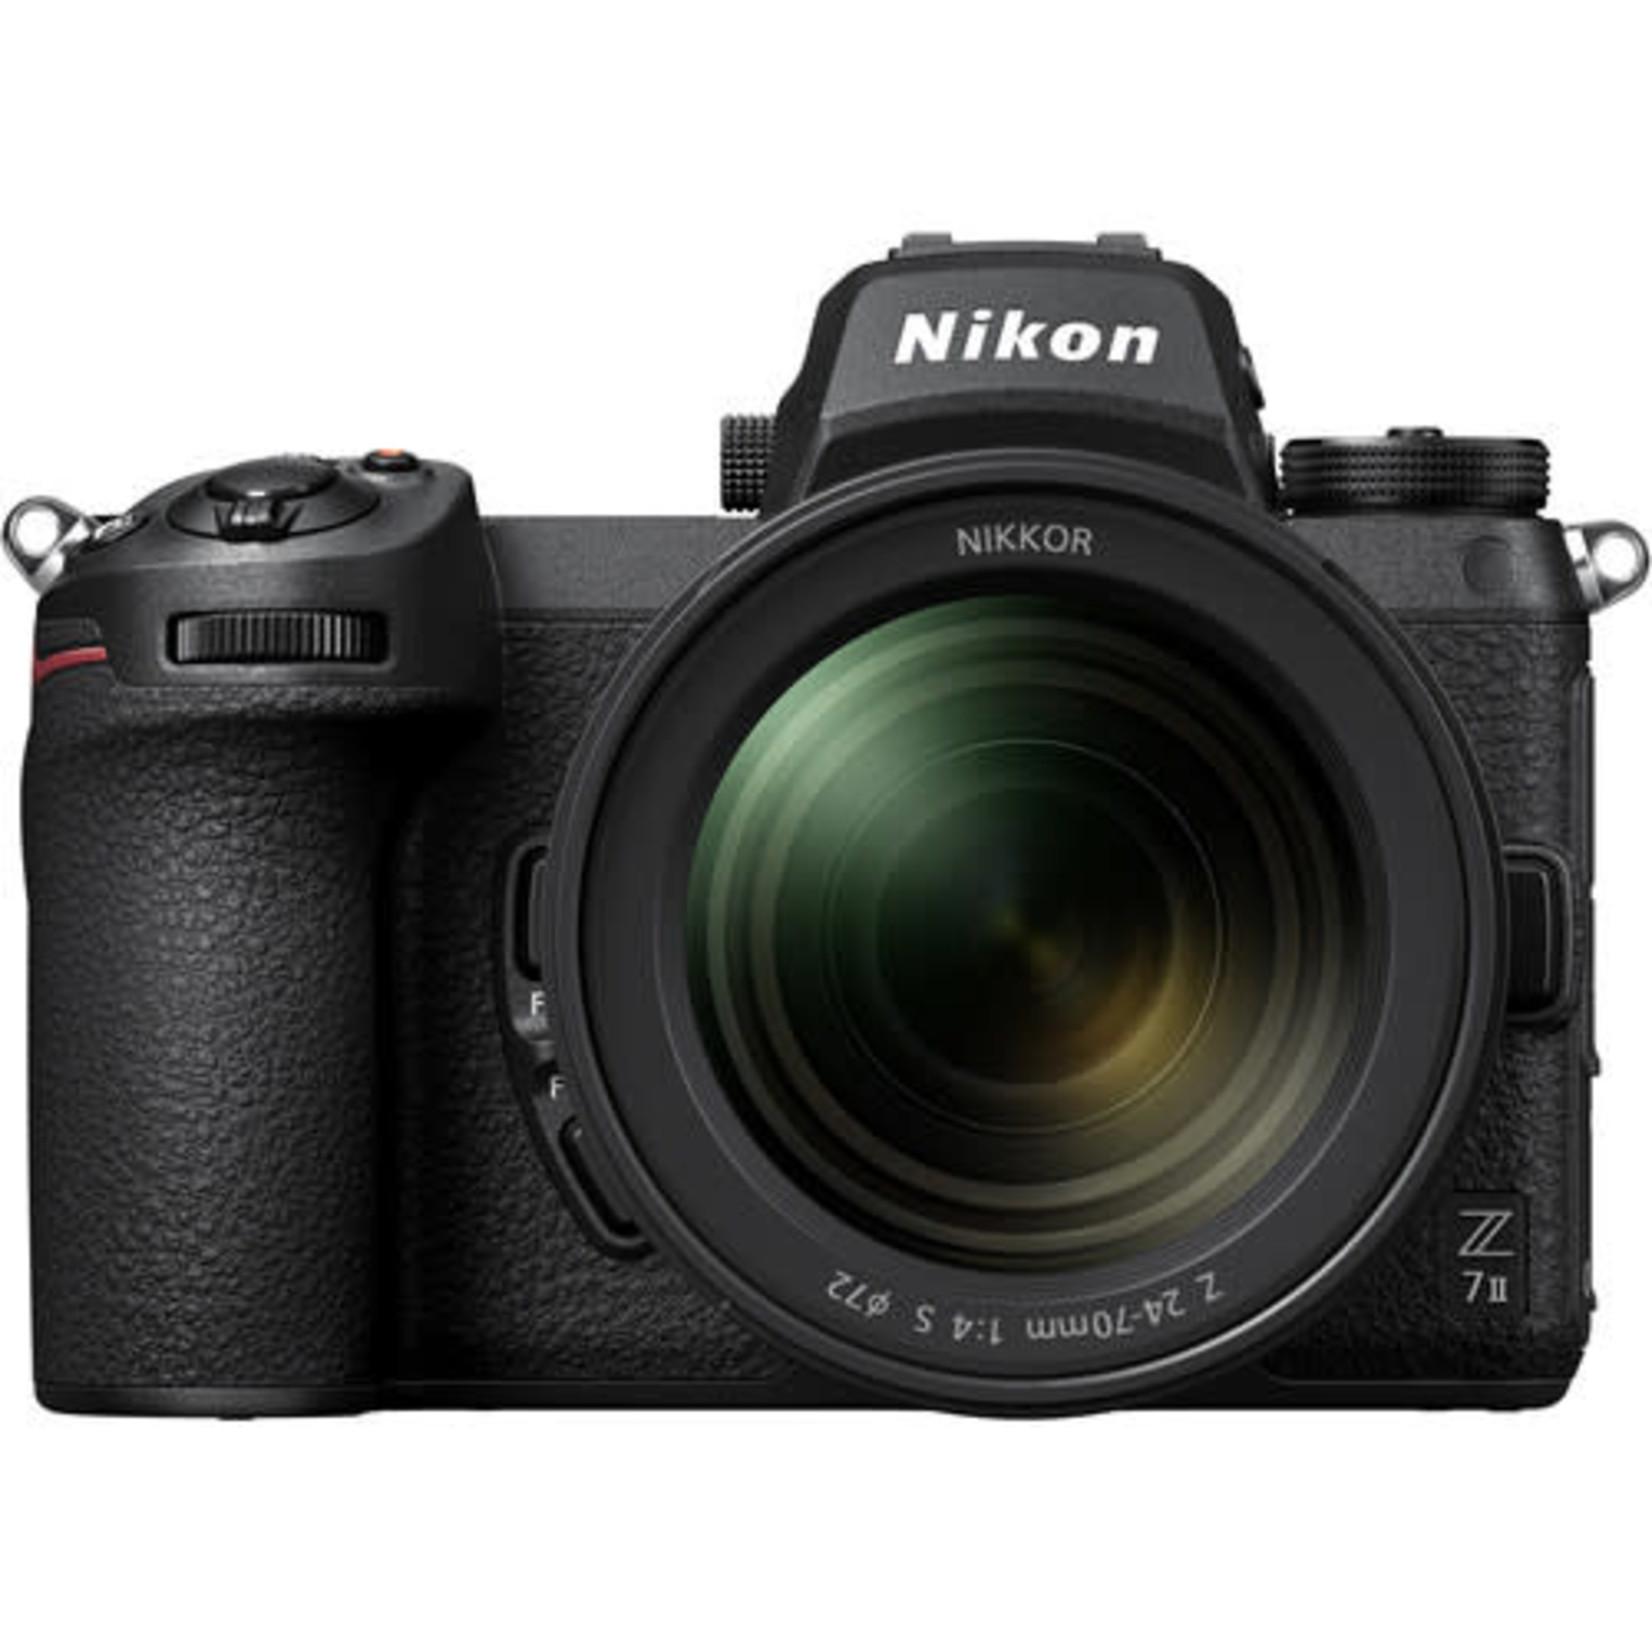 Nikon Nikon Z 7II Mirrorless Digital Camera with 24-70mm f/4 Lens